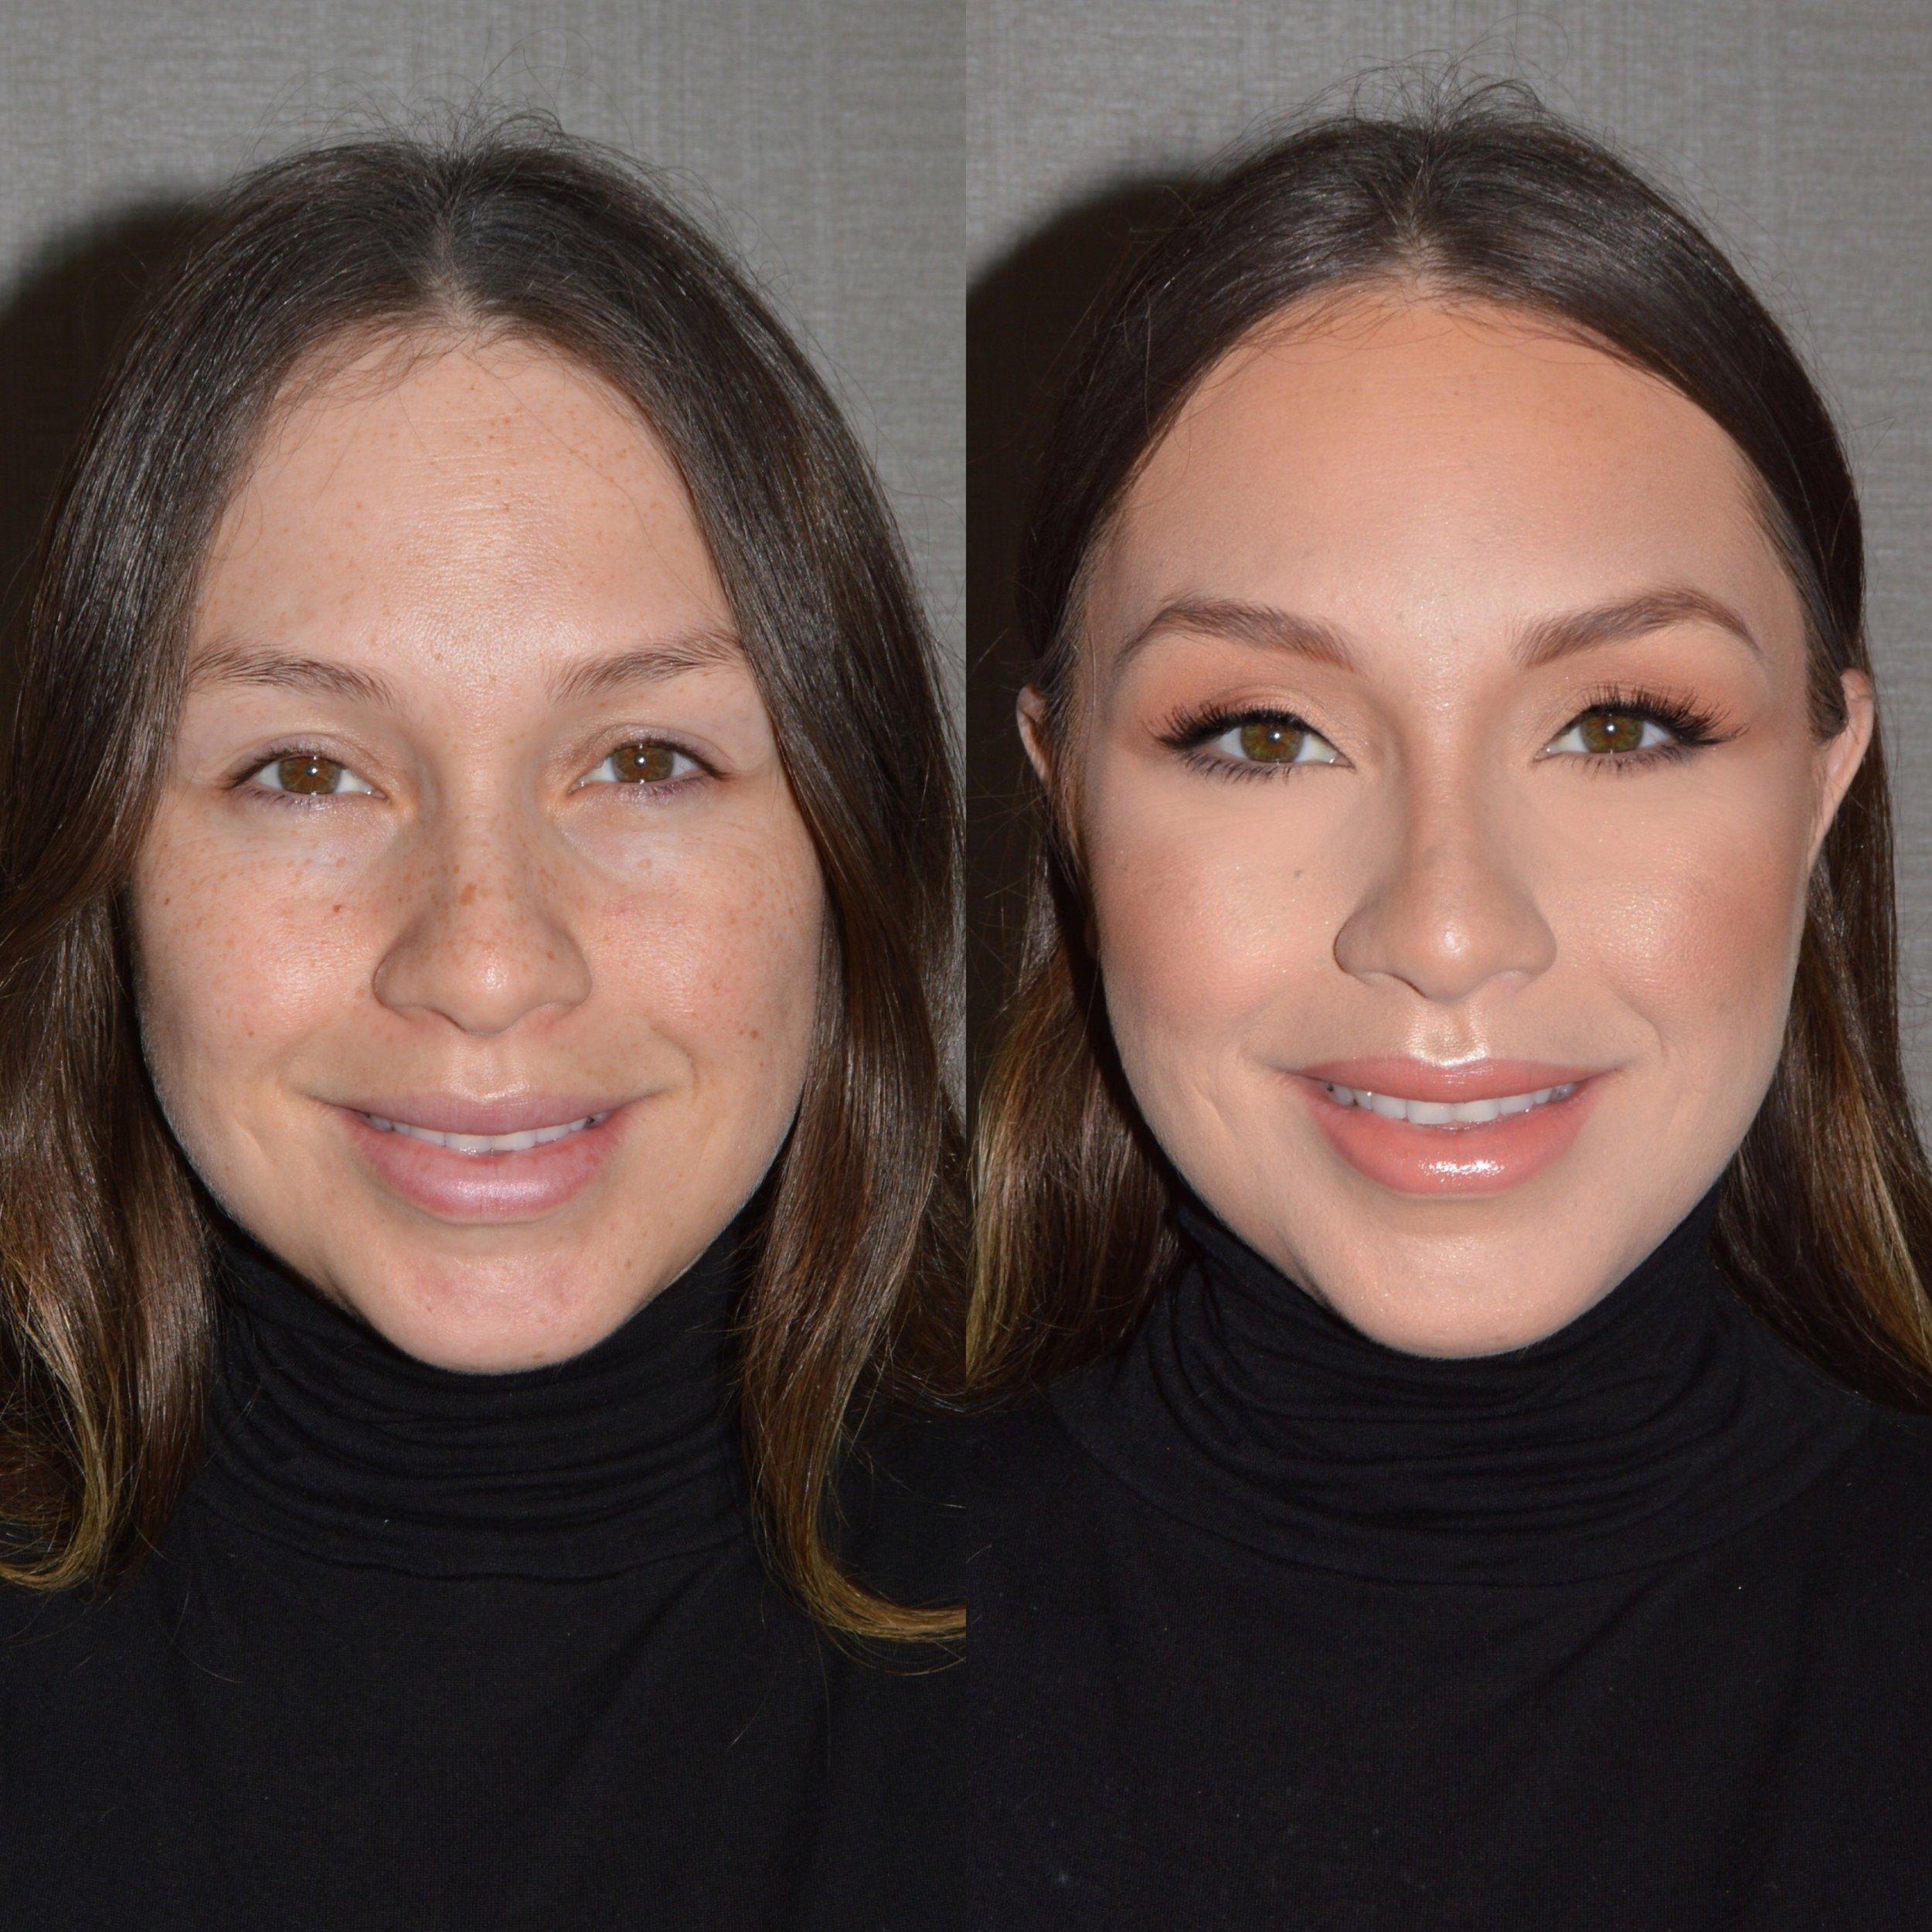 Patricia_Castro_Makeup_Los_Angeles_Makeup_Artist_61.JPG